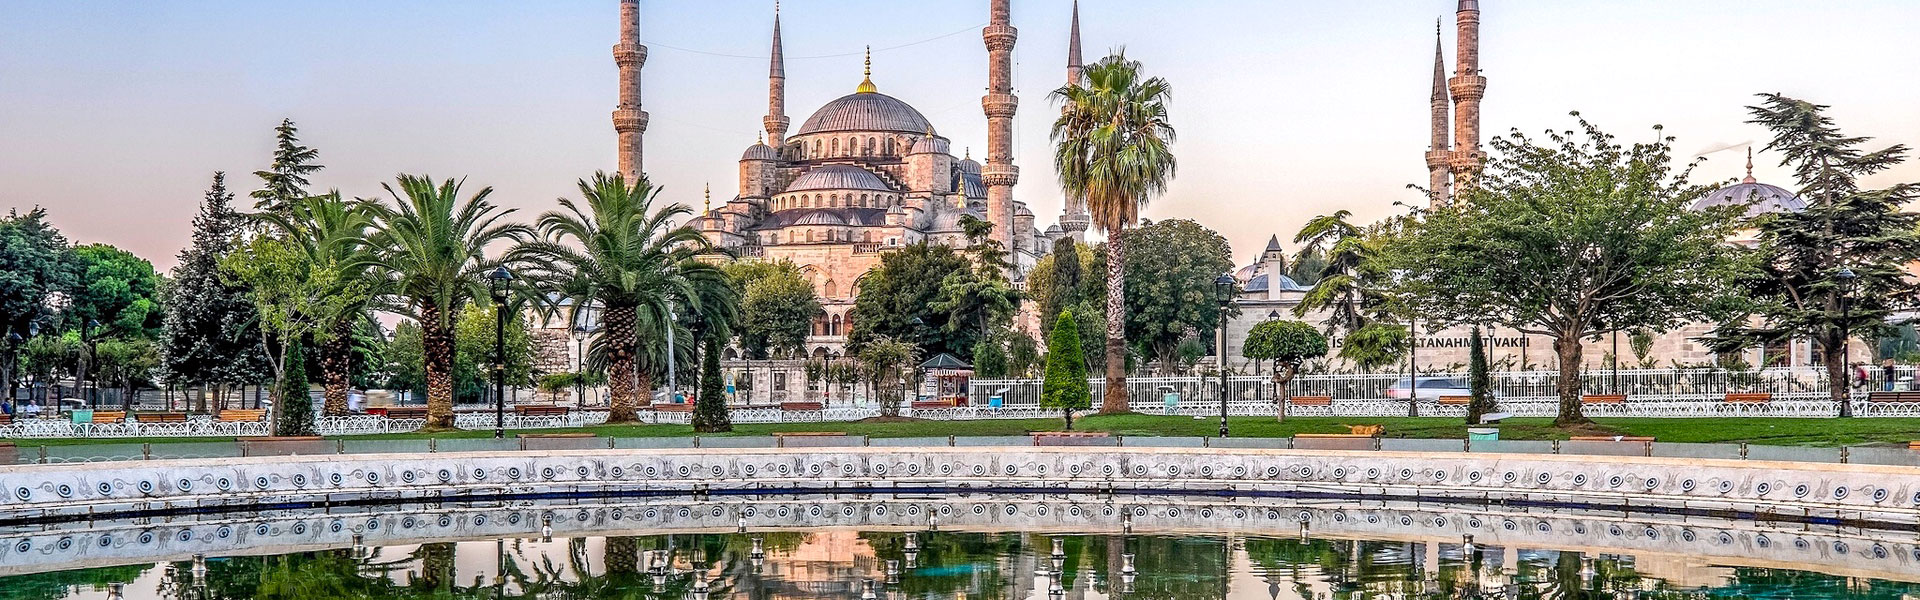 Istanbul | 09.11.